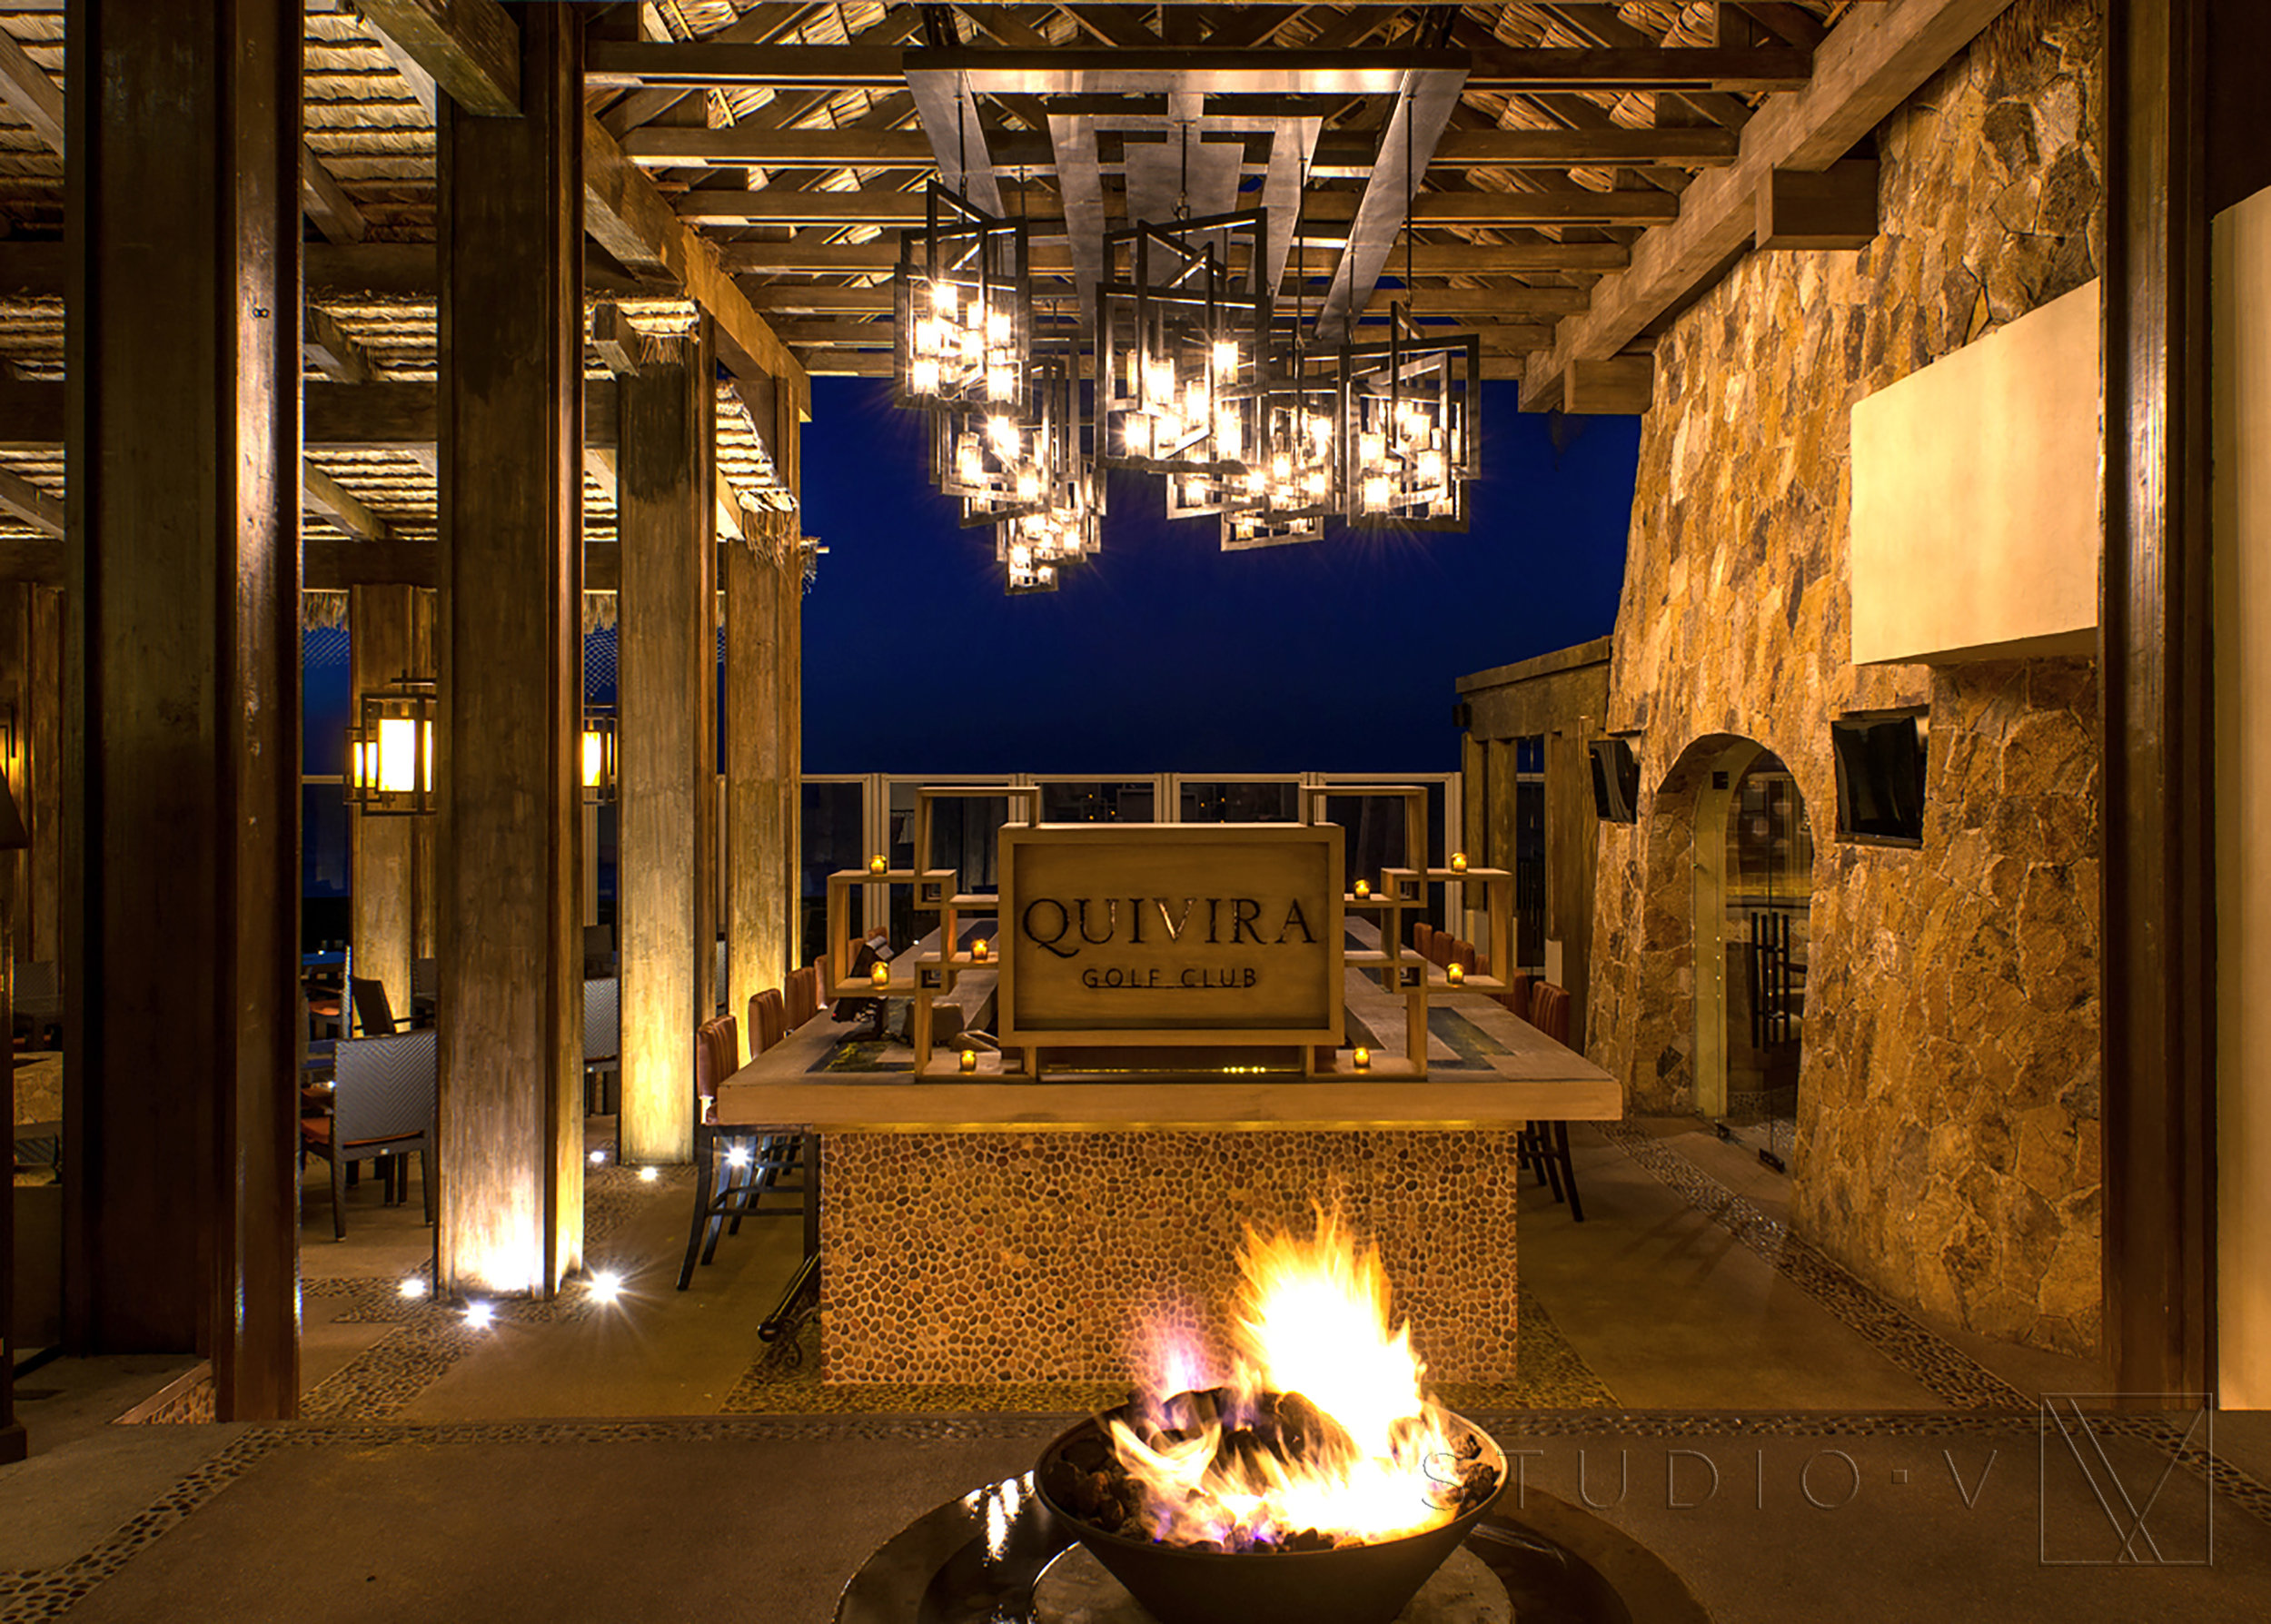 Quivira Clubhouse Sunset Beach Cabo San Lucas Studio V Interior Architecture and Design Scottsdale Arizona AZ (33).jpg